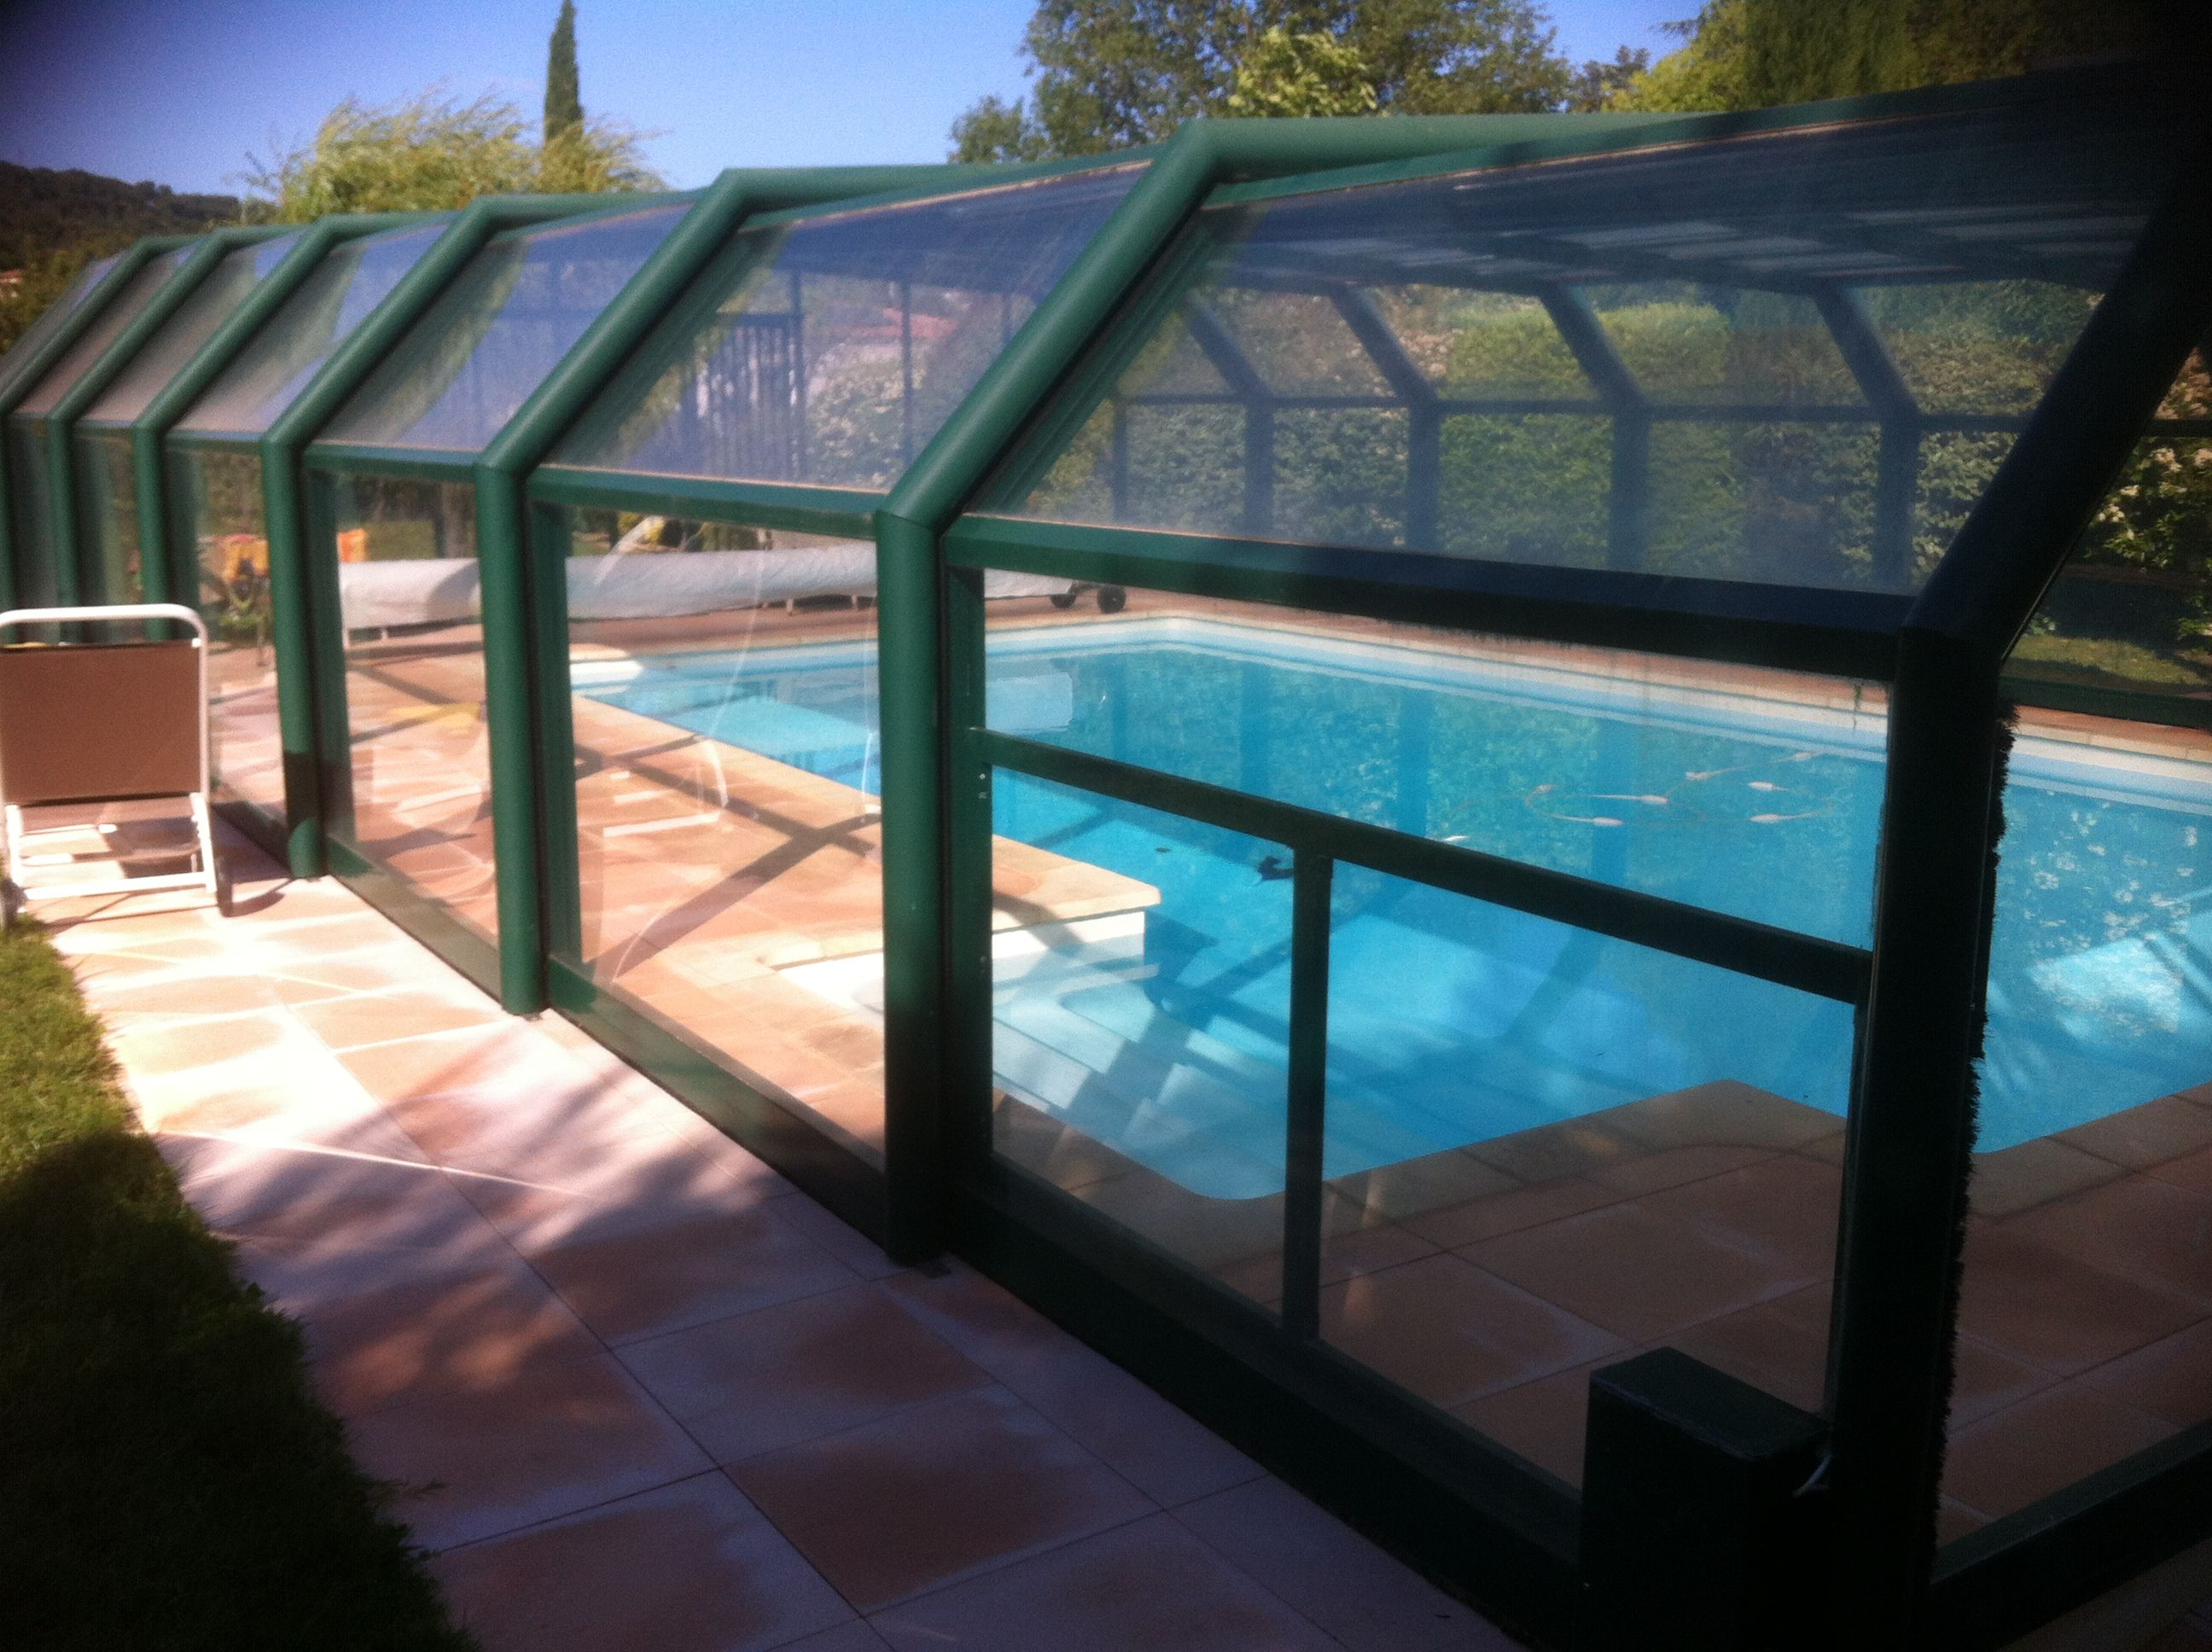 Entretien abri de piscines poseidon for Entretien abris piscine